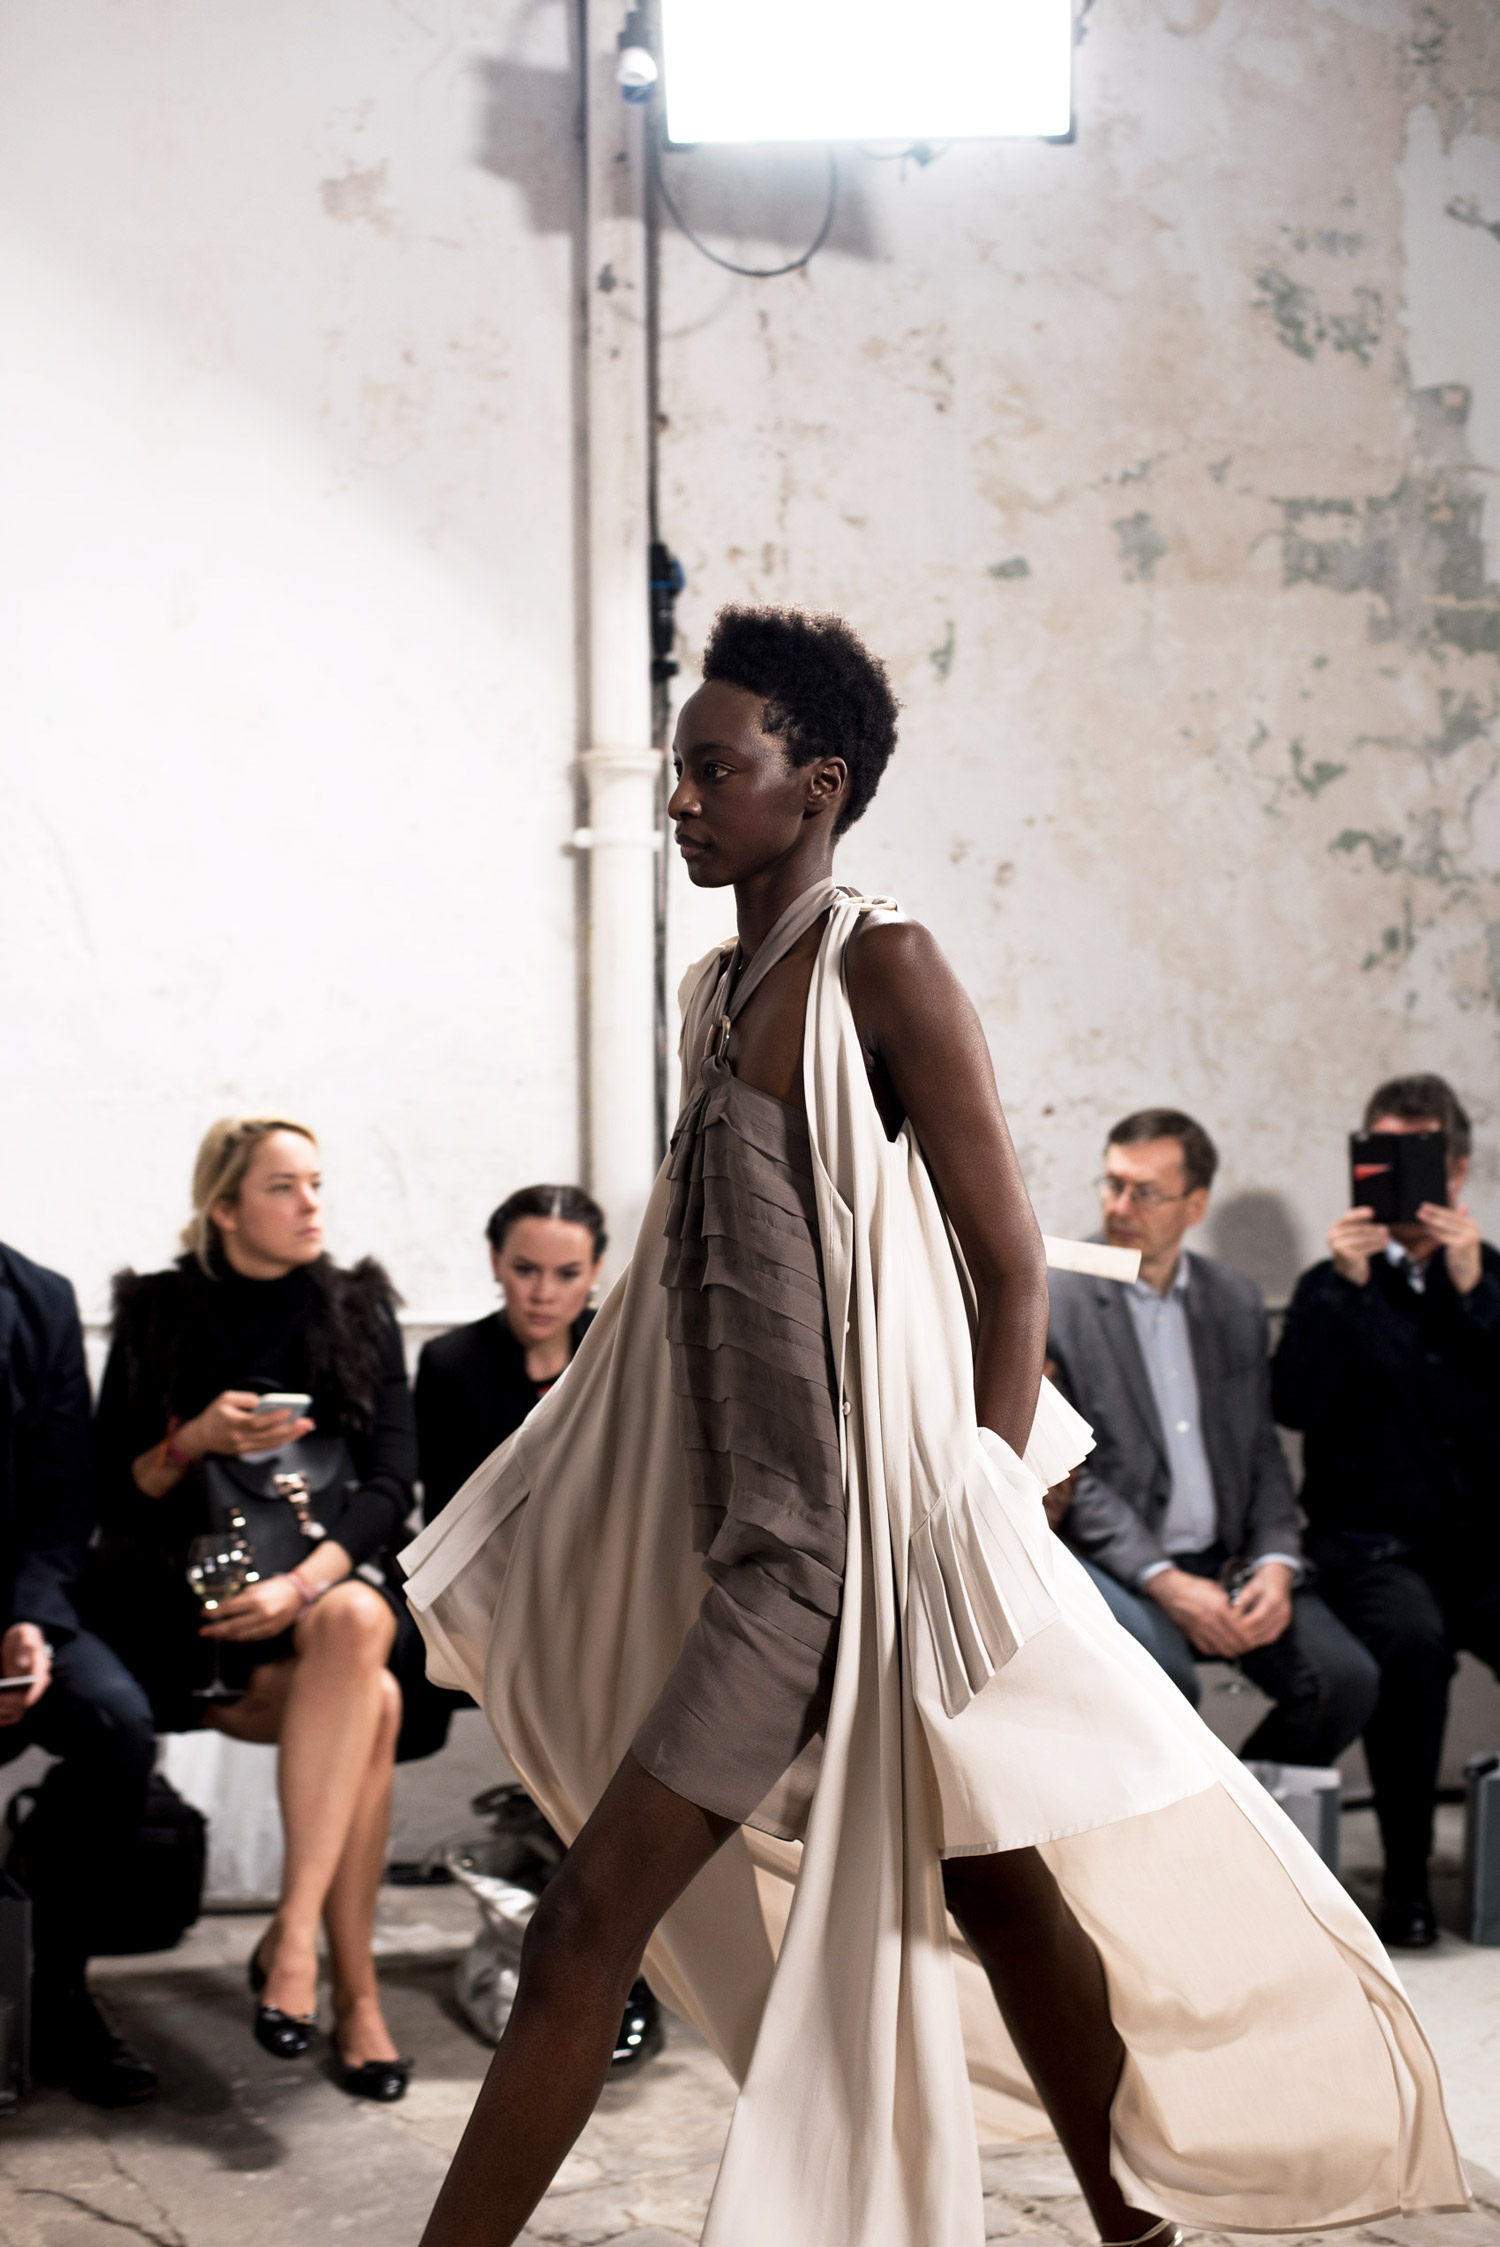 paris-fashion-week-nobi-talai-show-fashiioncarpet.jpg